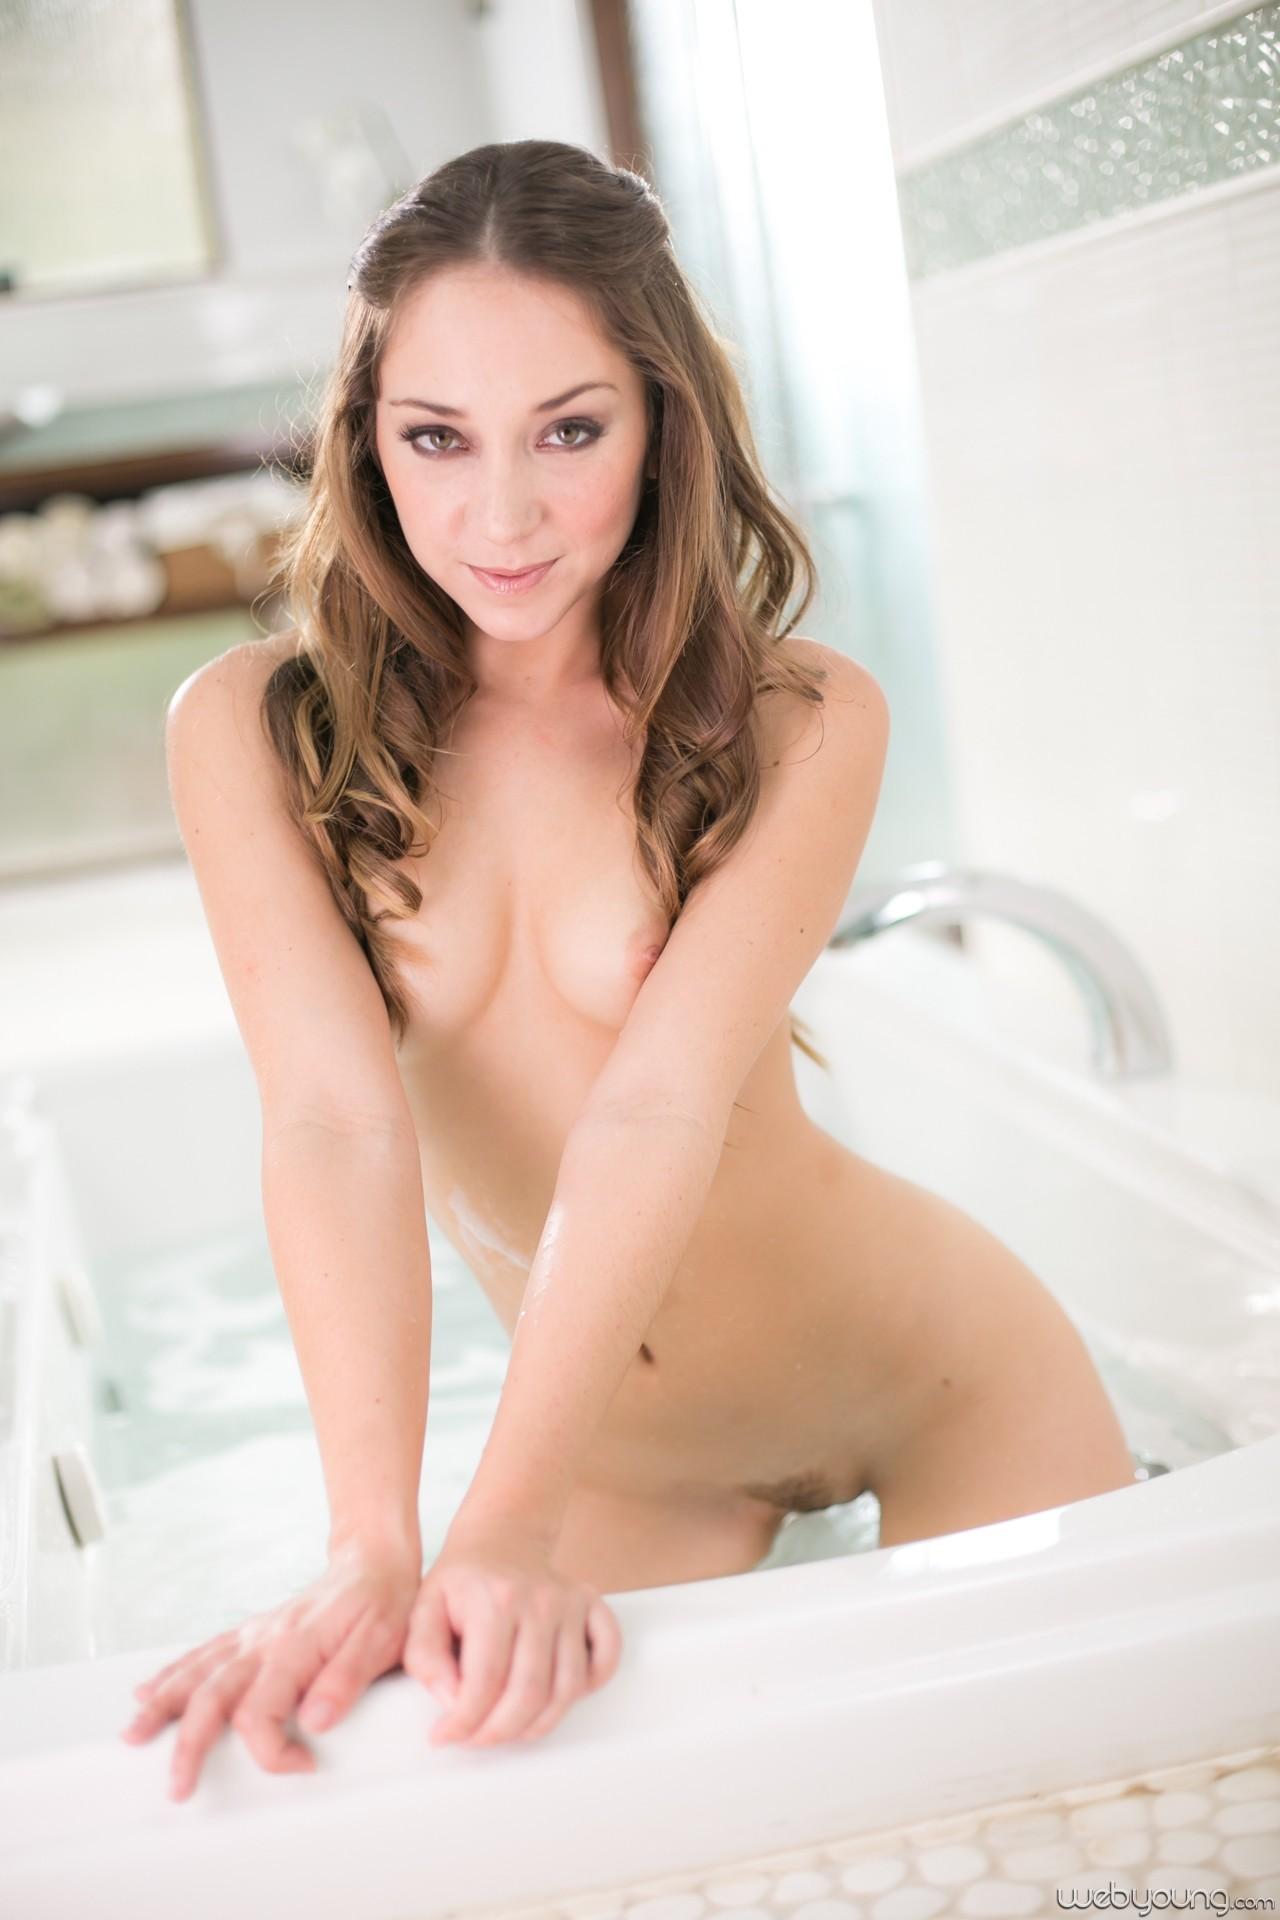 Remy Lacroix, Jenna Sativa - My Girlfriends First Time 76886-8083